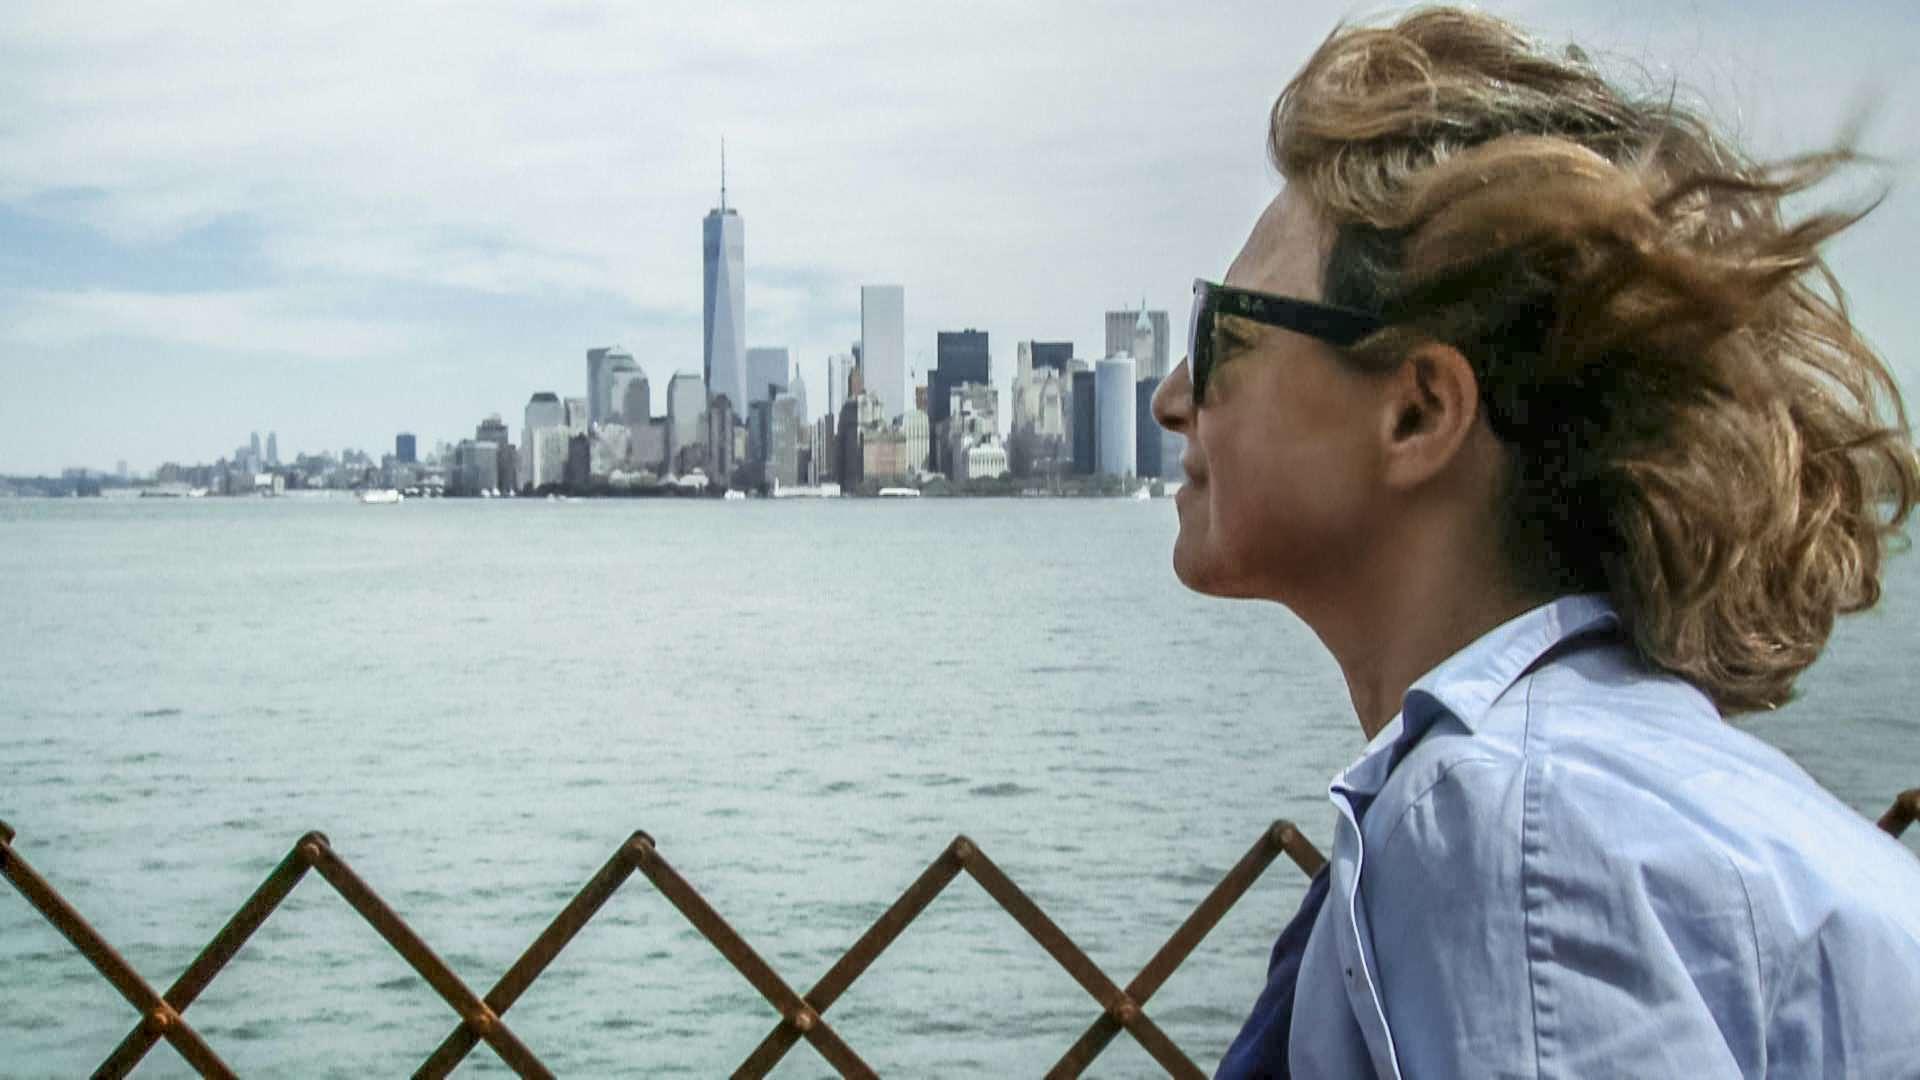 I don't belong anywhere – Le cinéma de Chantal Ackerman